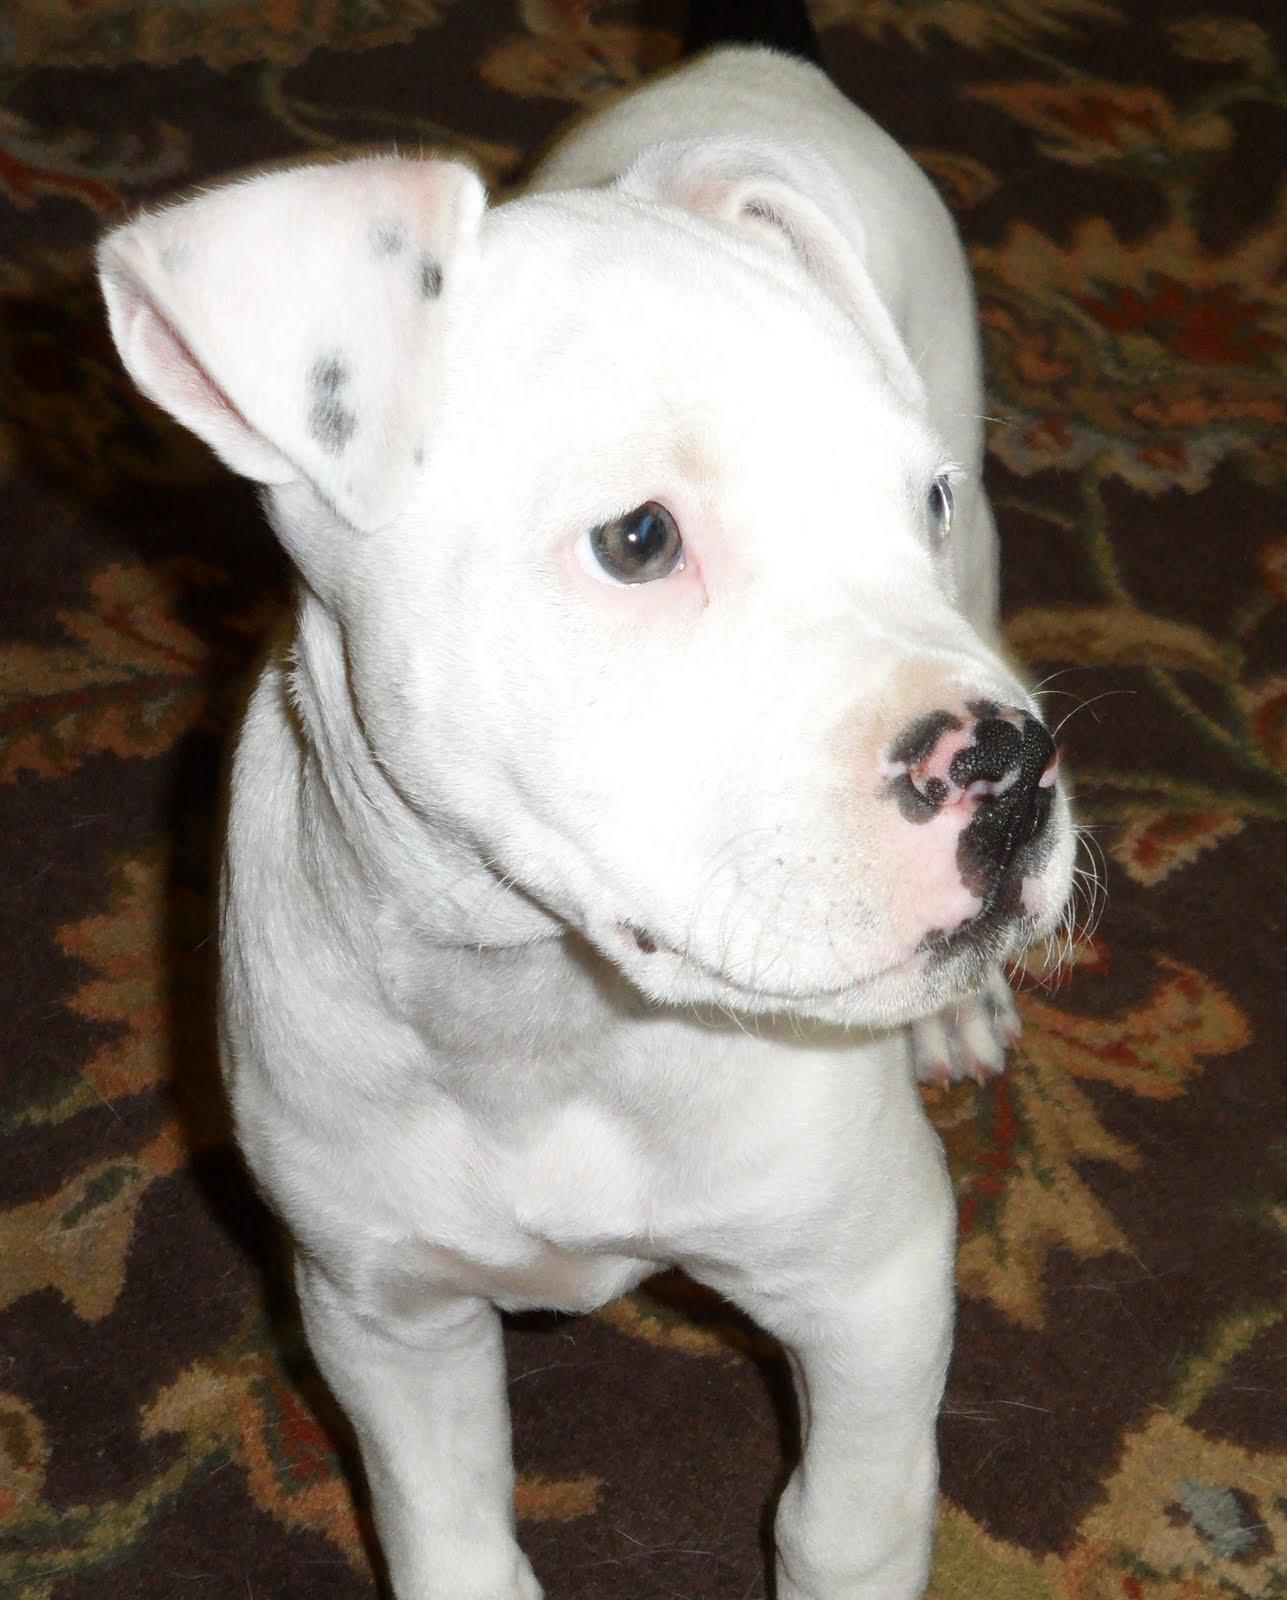 Lucky Dog Rescue Blog: Greta, the Deaf Pit Bull Puppy